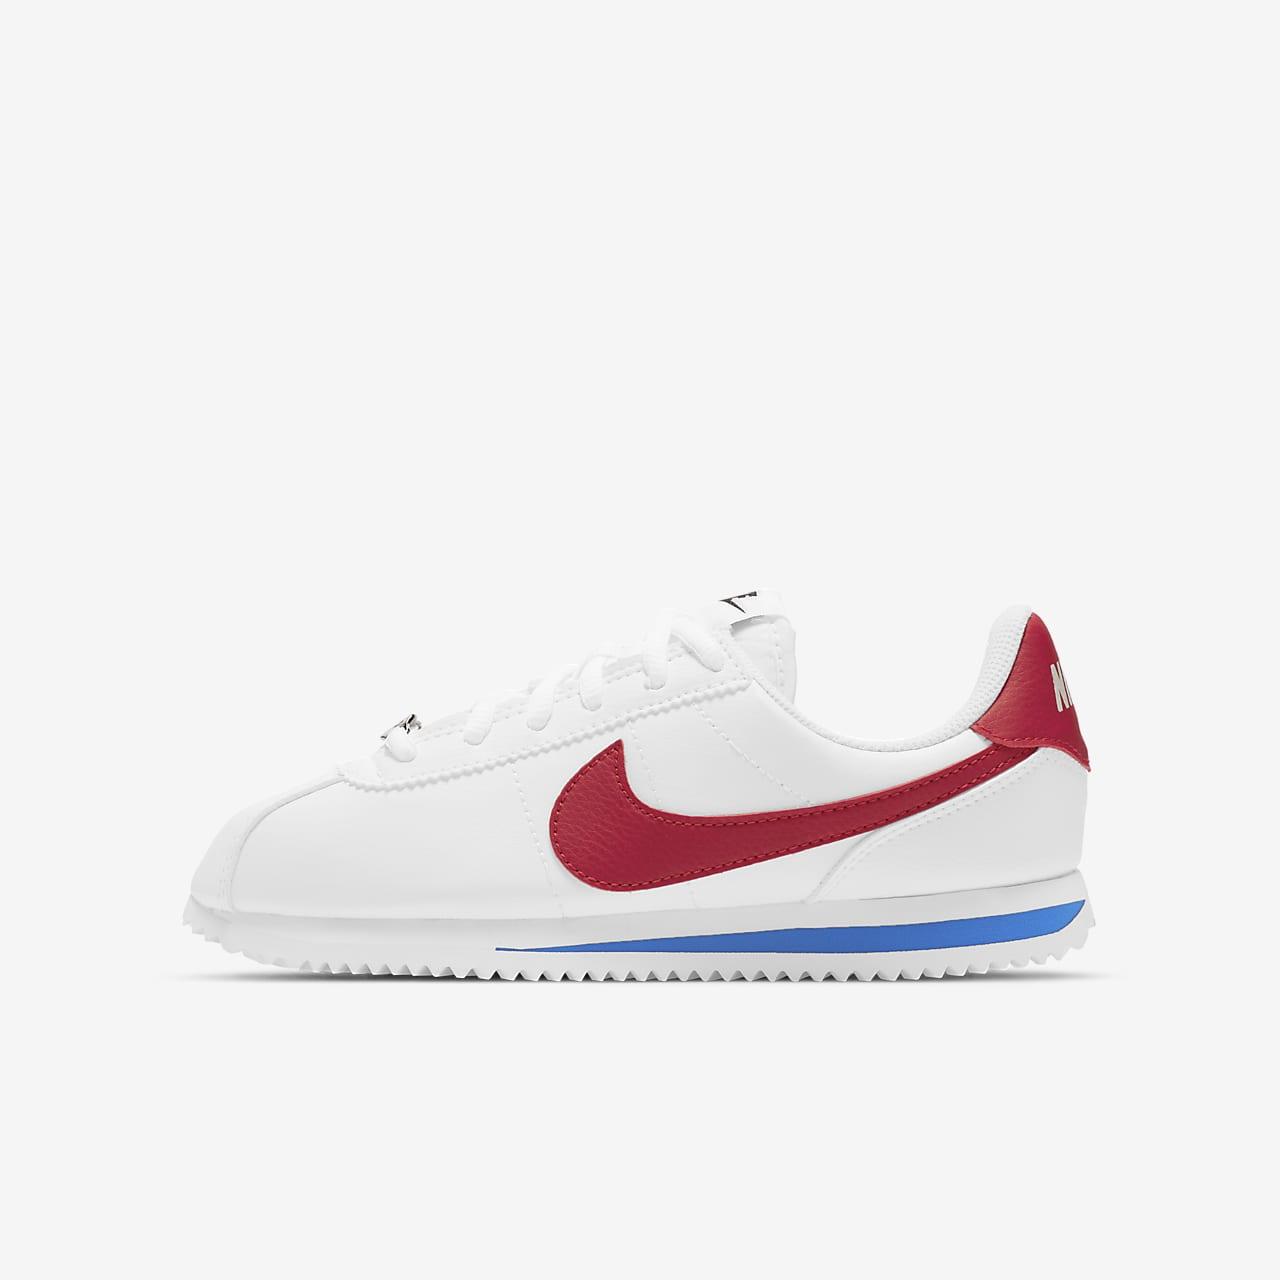 Sko Nike Cortez Basic SL för ungdom